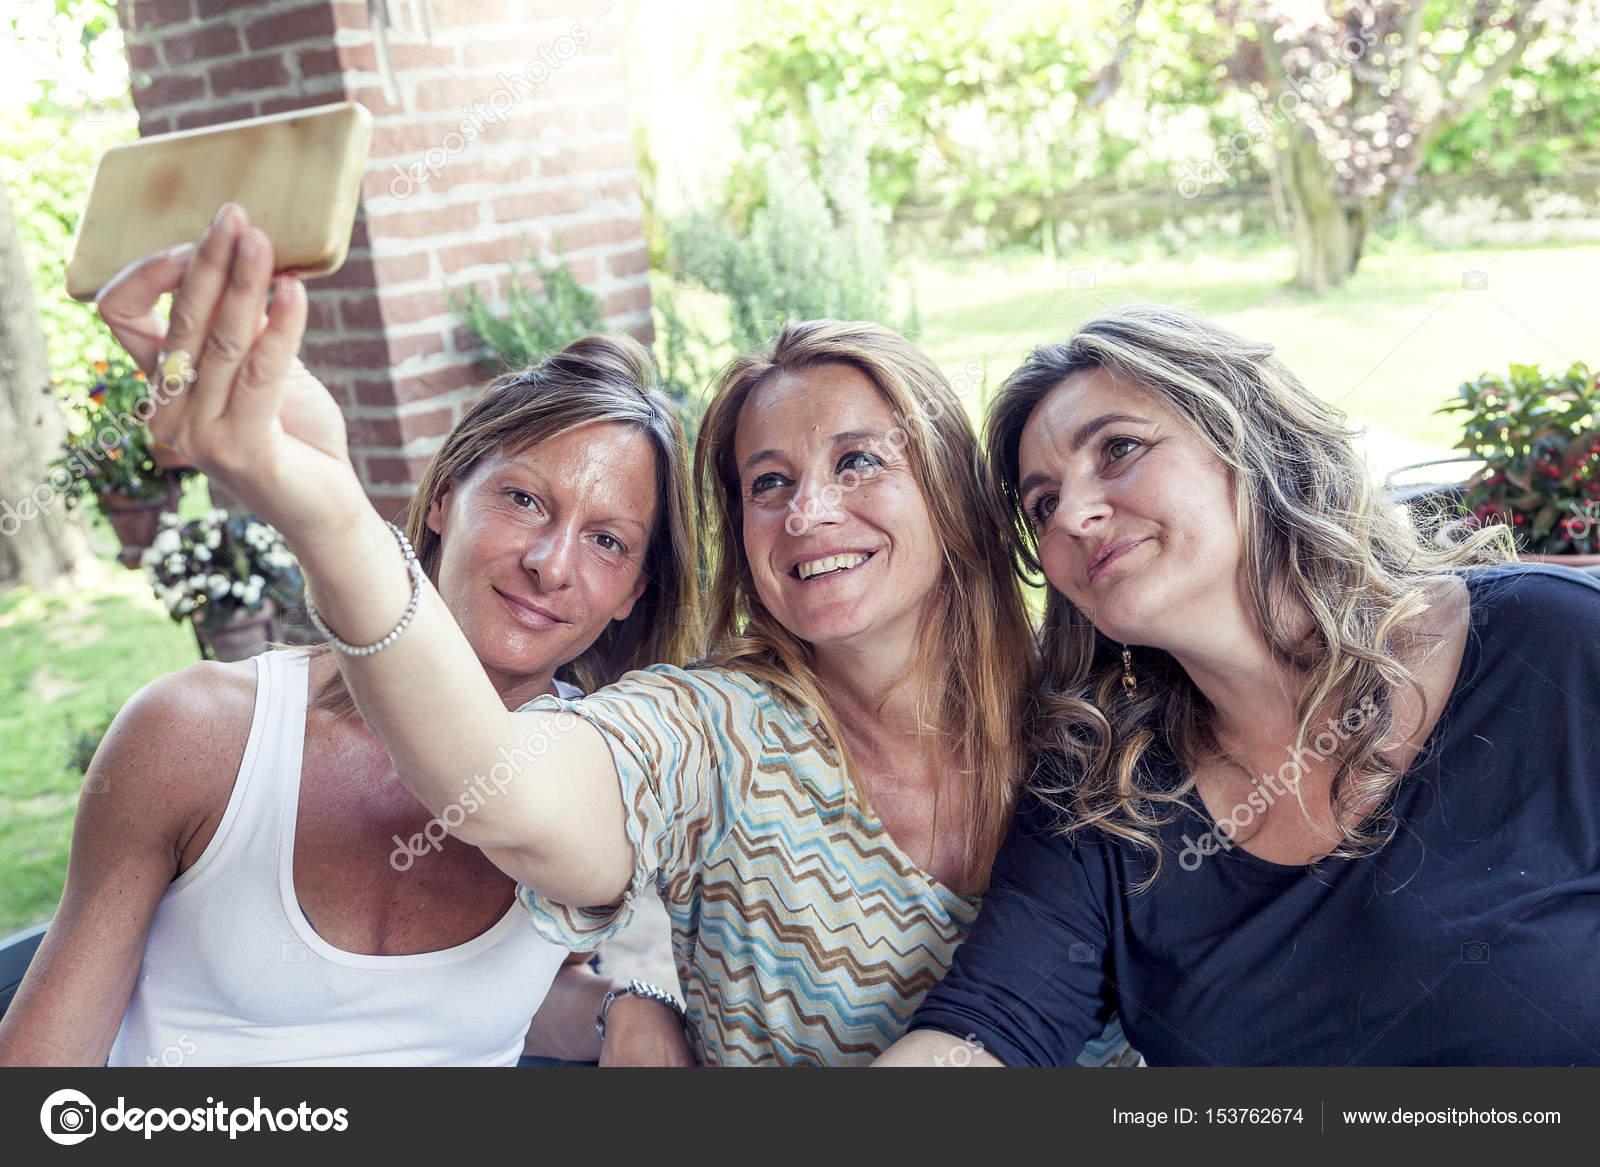 Teen Lesbians Having Fun